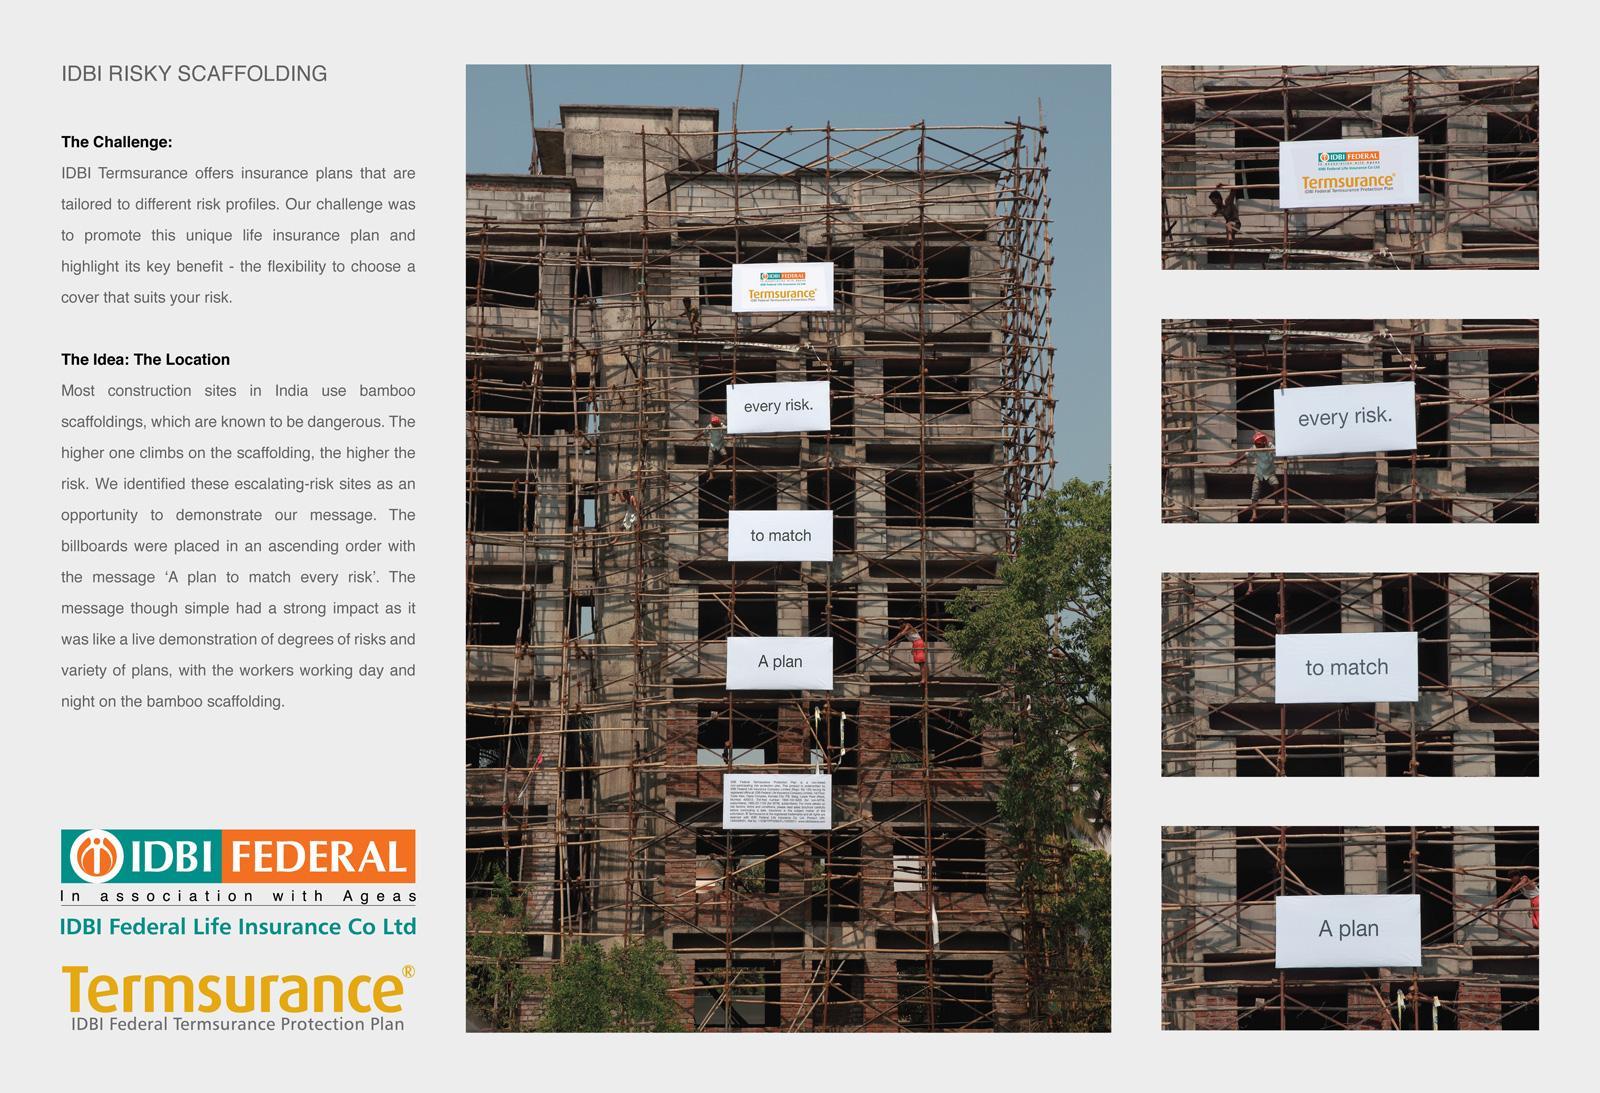 IDBI Federal Outdoor Ad -  Risky scaffolding